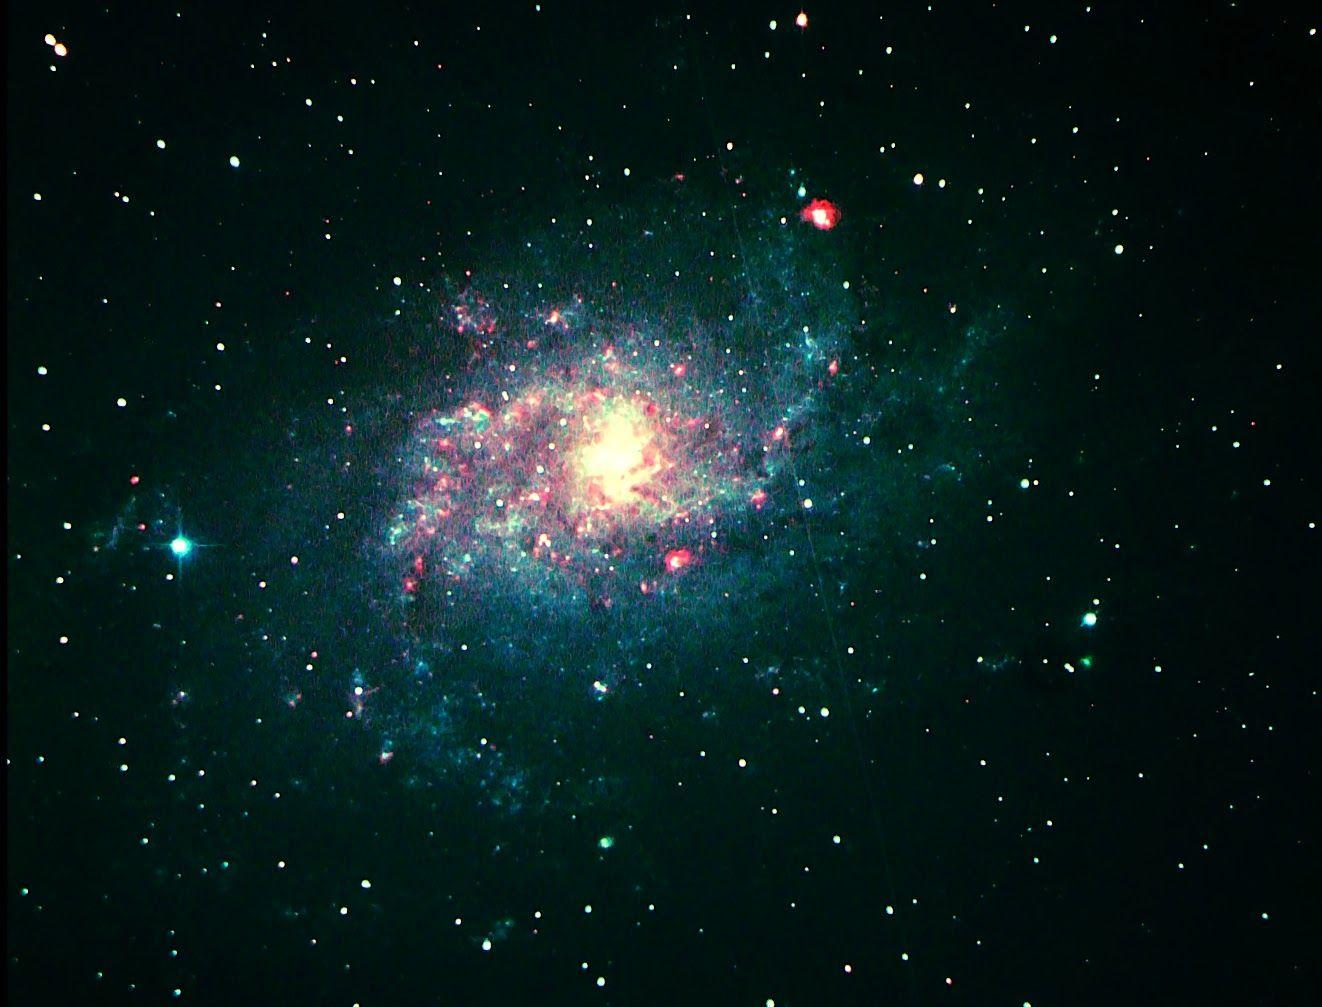 galaxy tumblr background hd - photo #27